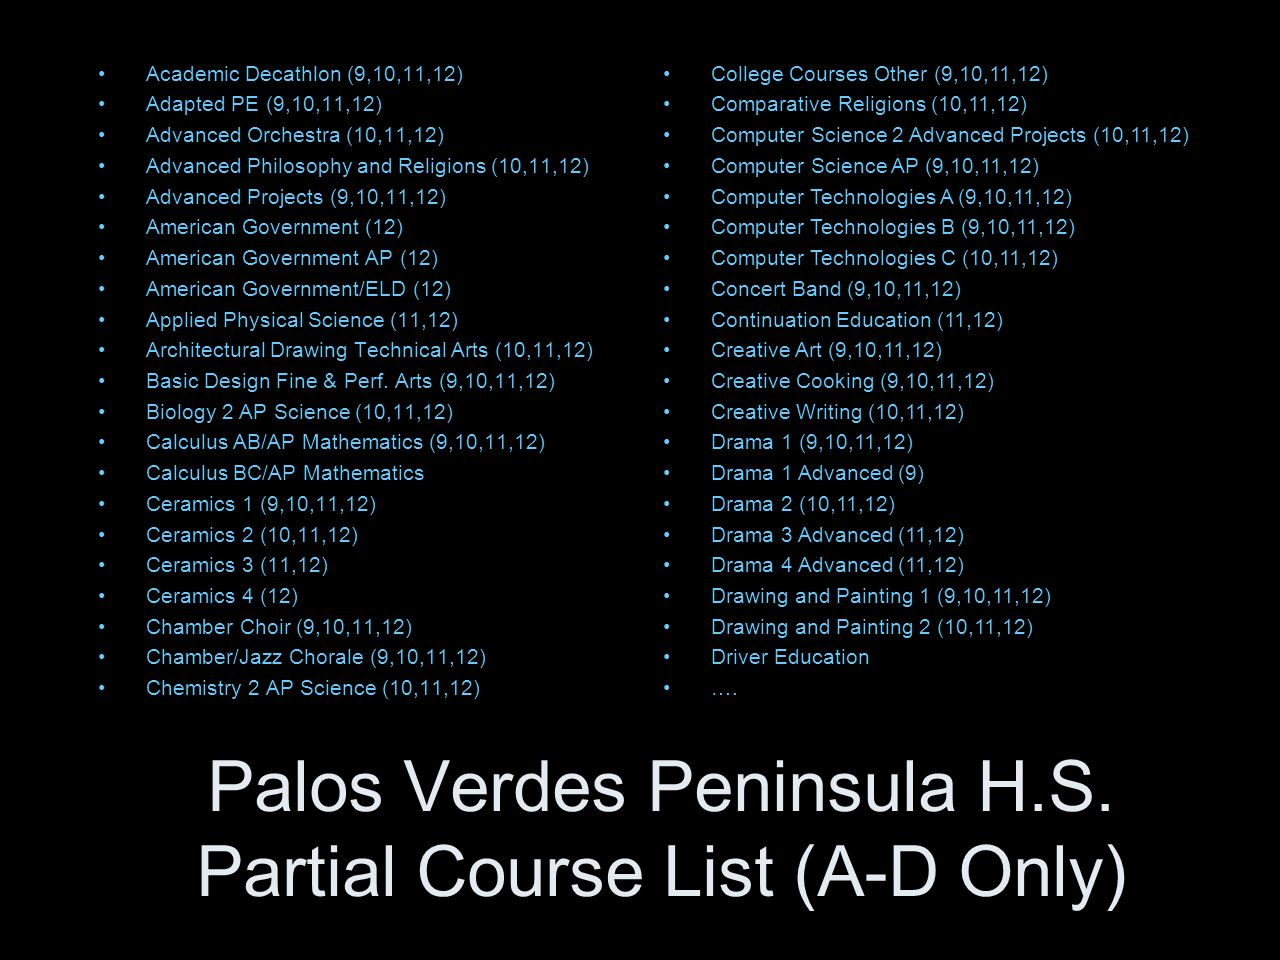 Palos Verdes Peninsula H.S. Partial Course List (A-D Only) Academic Decathlon (9,10,11,12) Adapted PE (9,10,11,12) Advanced Orchestra (10,11,12) Advan